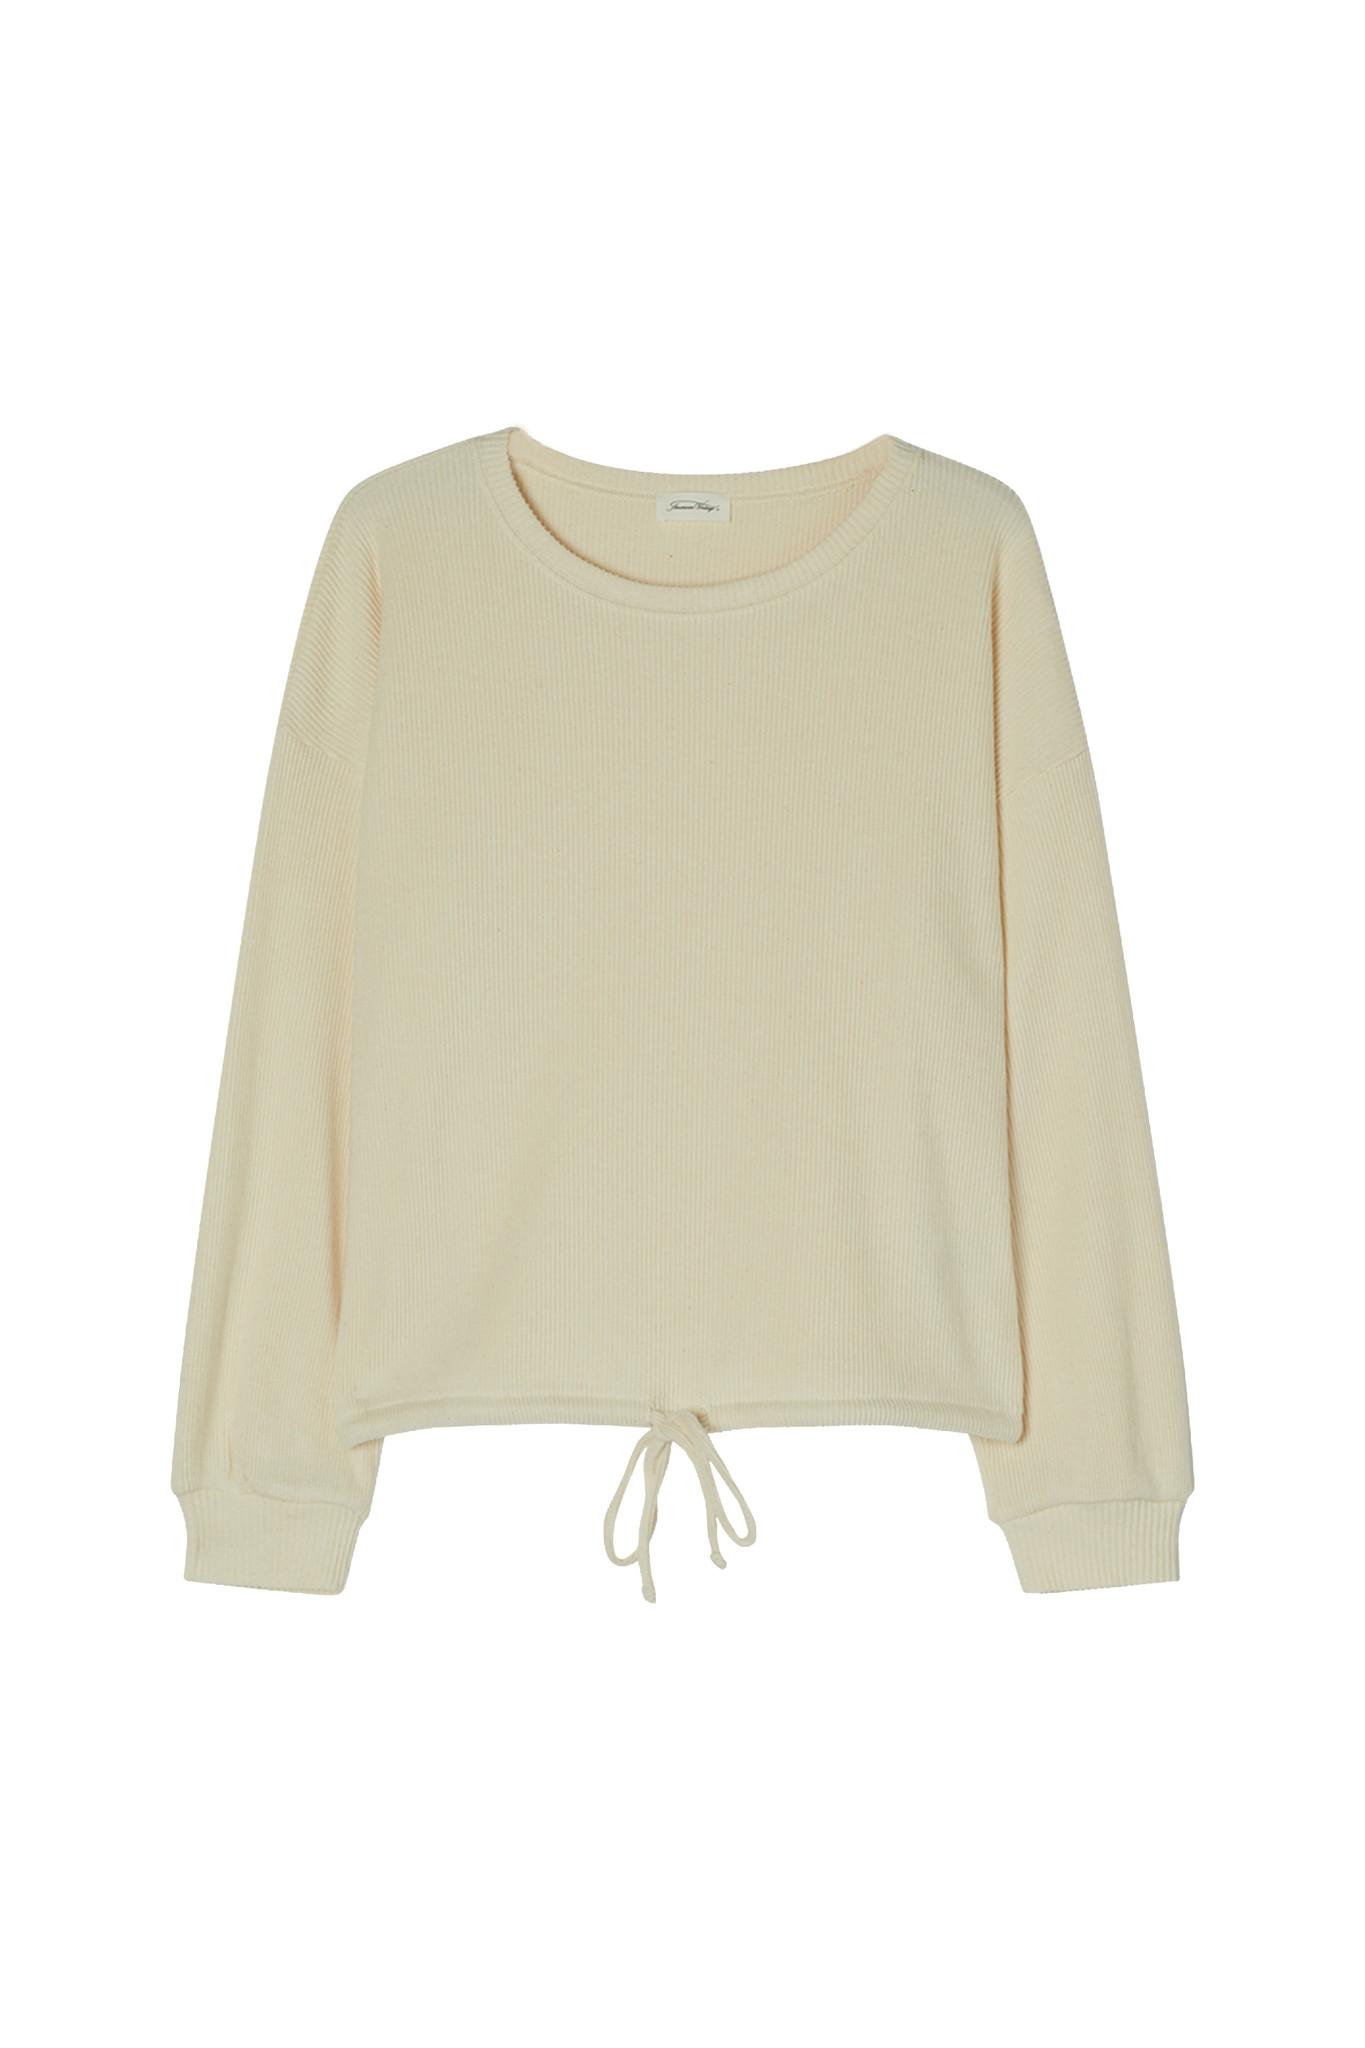 Riricake Sweater - Ecru Melange-1